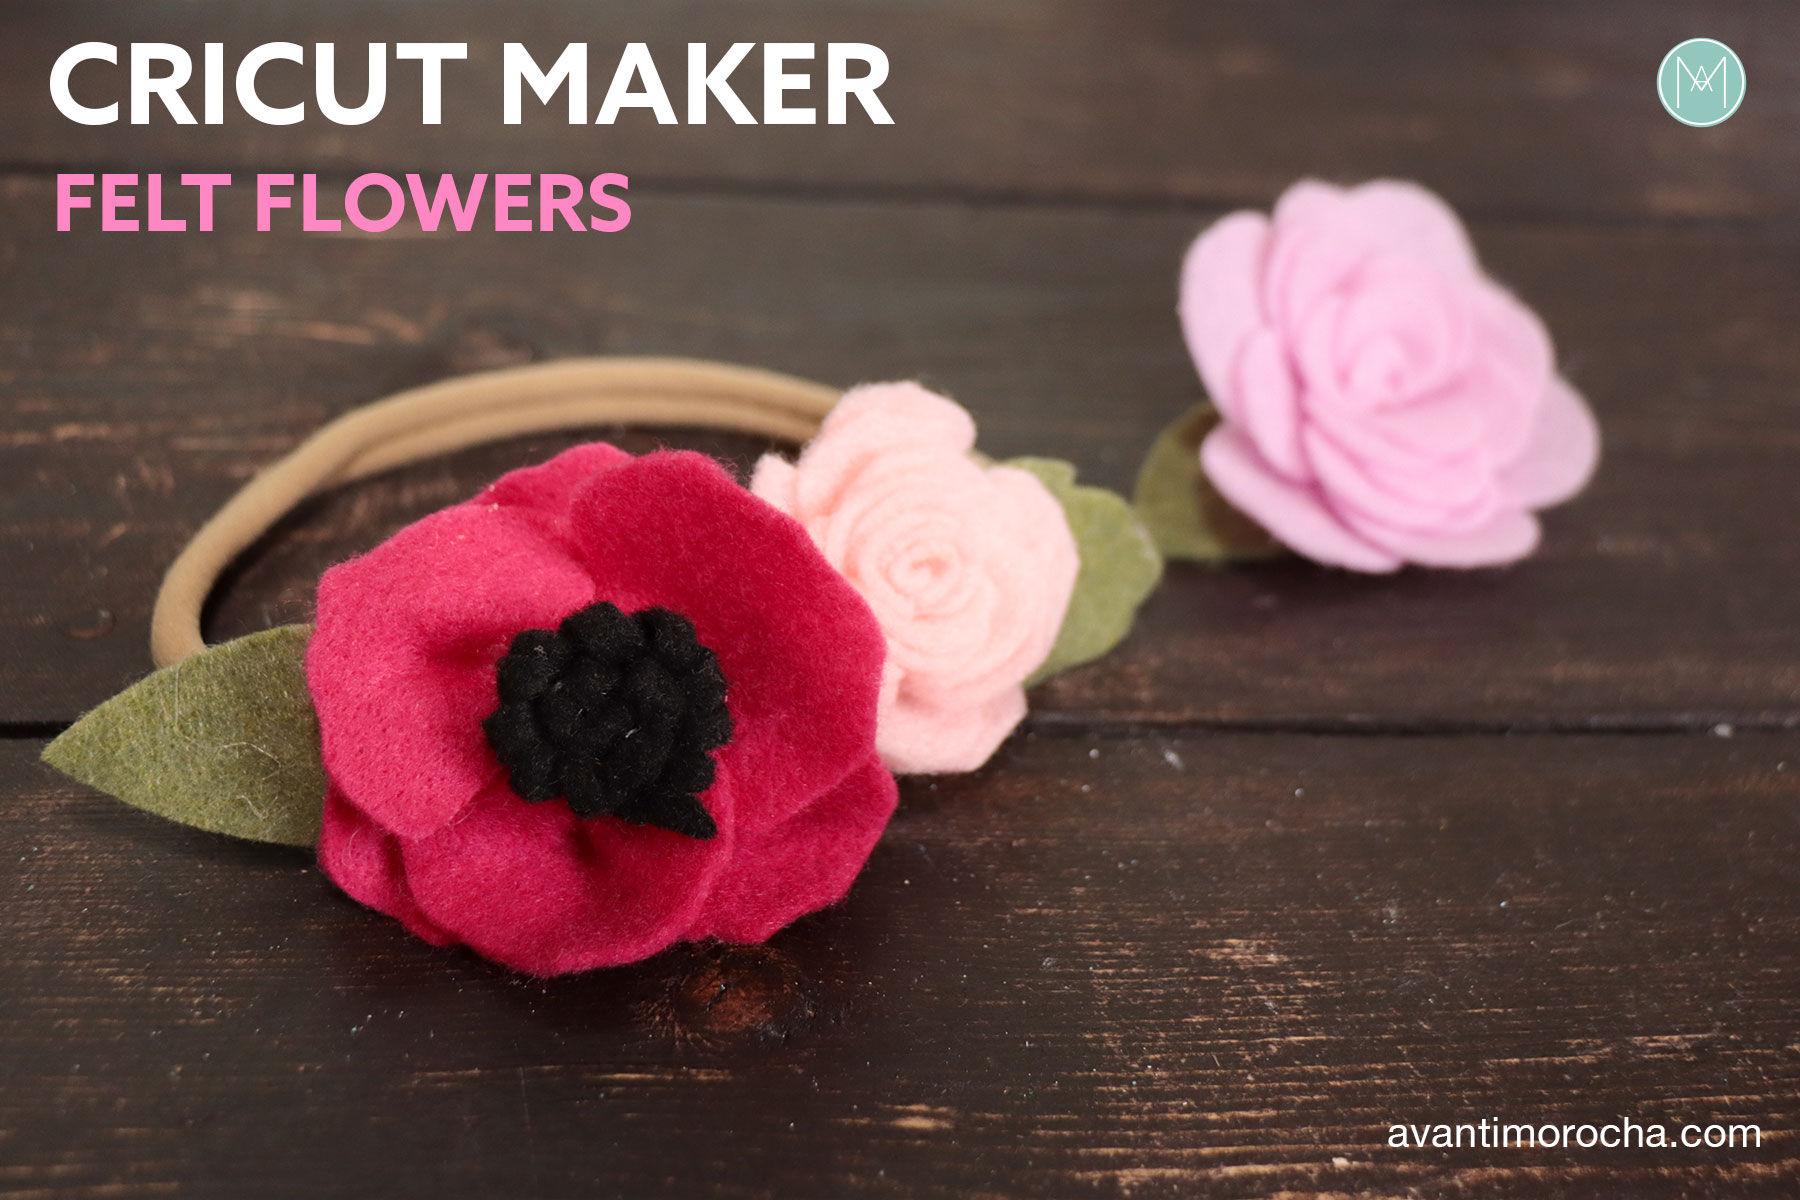 Cricut Felt Flowers